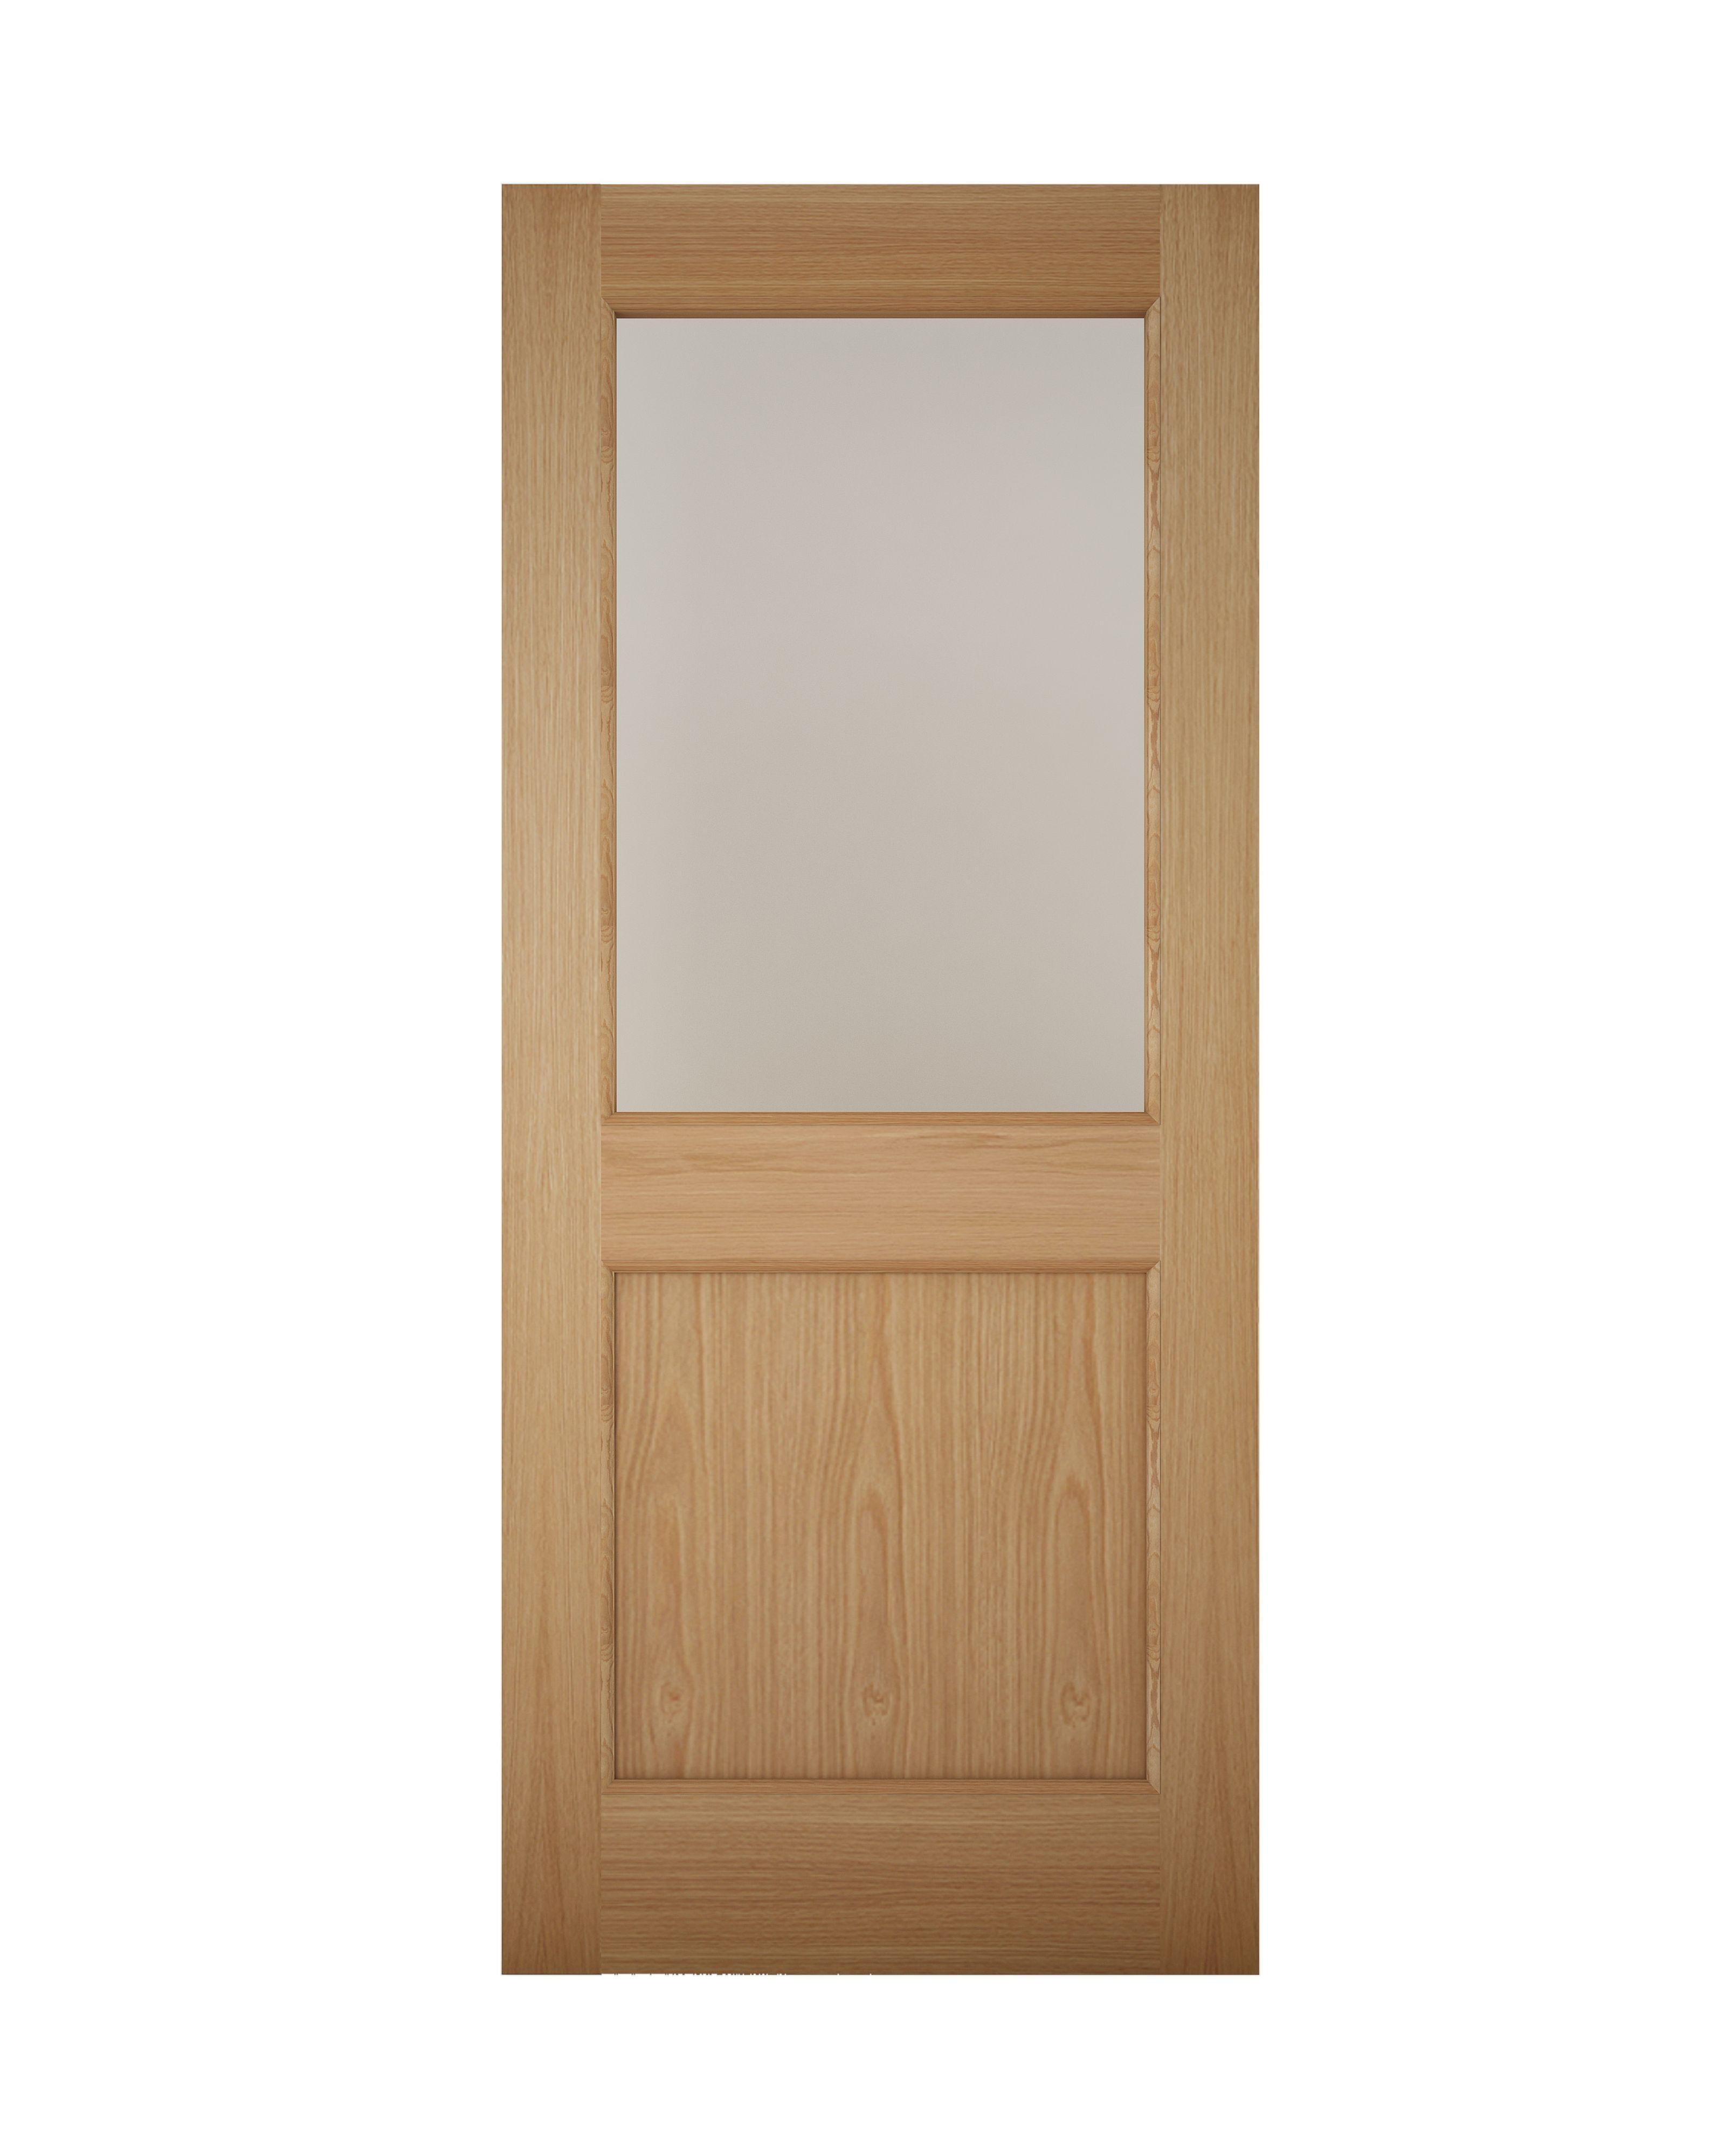 American White Oak Veneer Timber Glazed External Back Door H